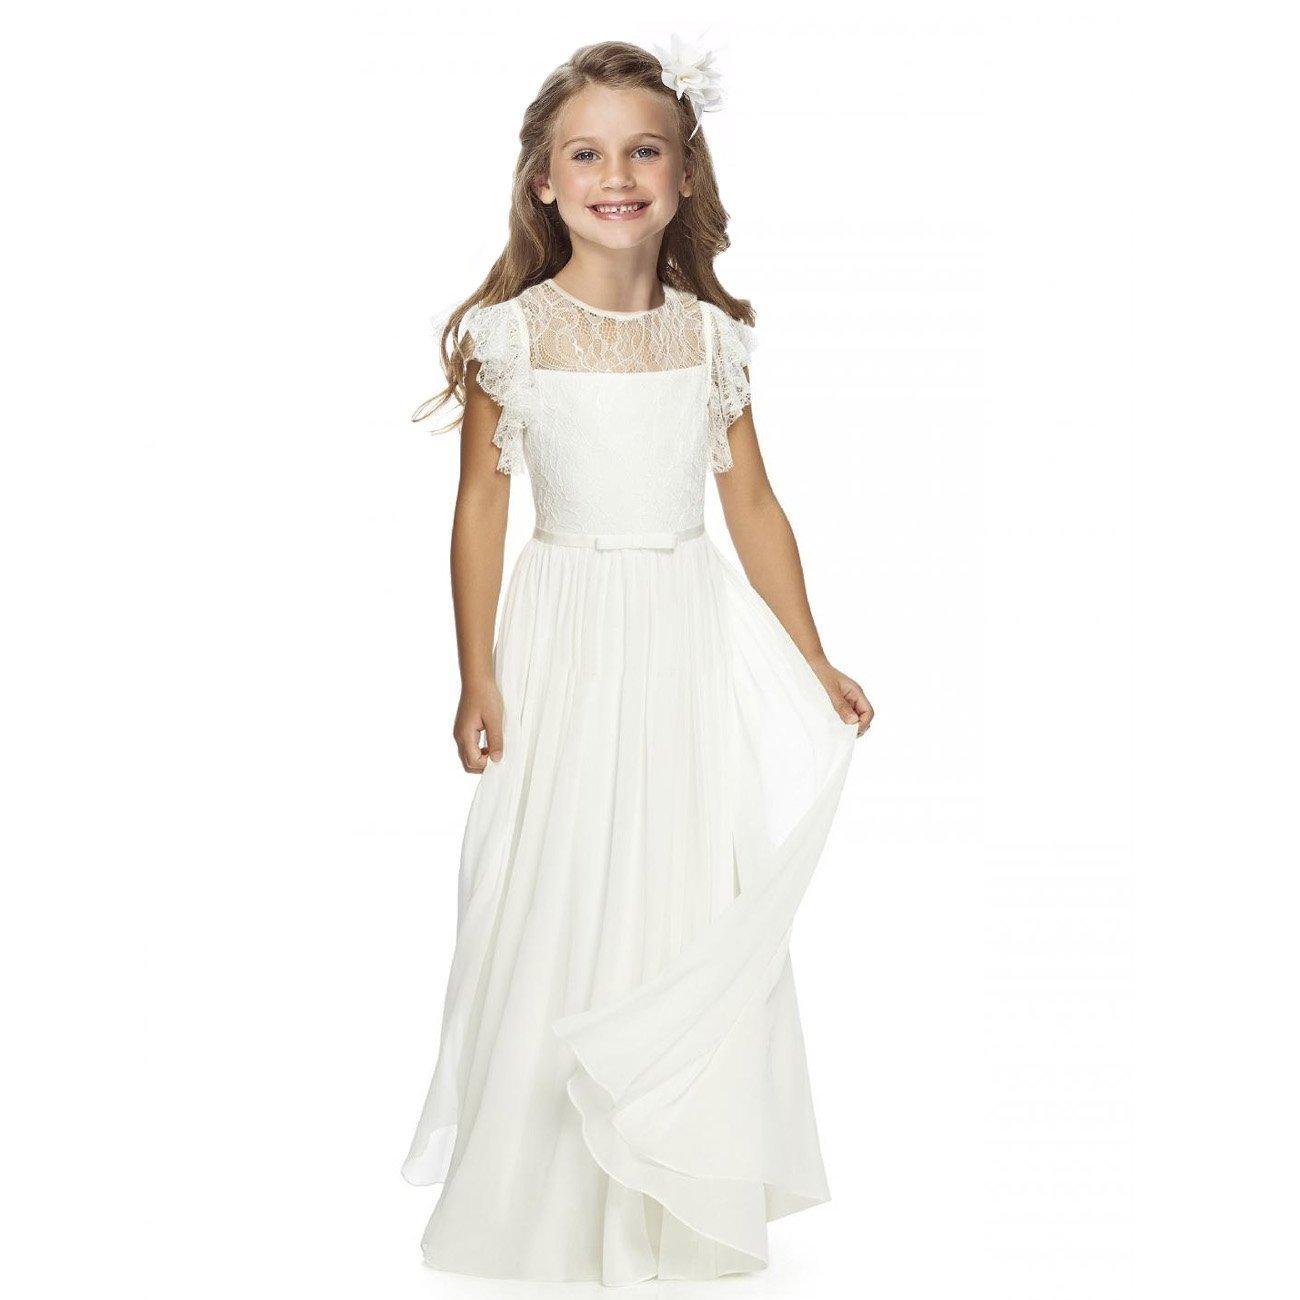 Sittingley Fancy Girls Holy Communion Dresses 1-12 Year Old Off White Size 10